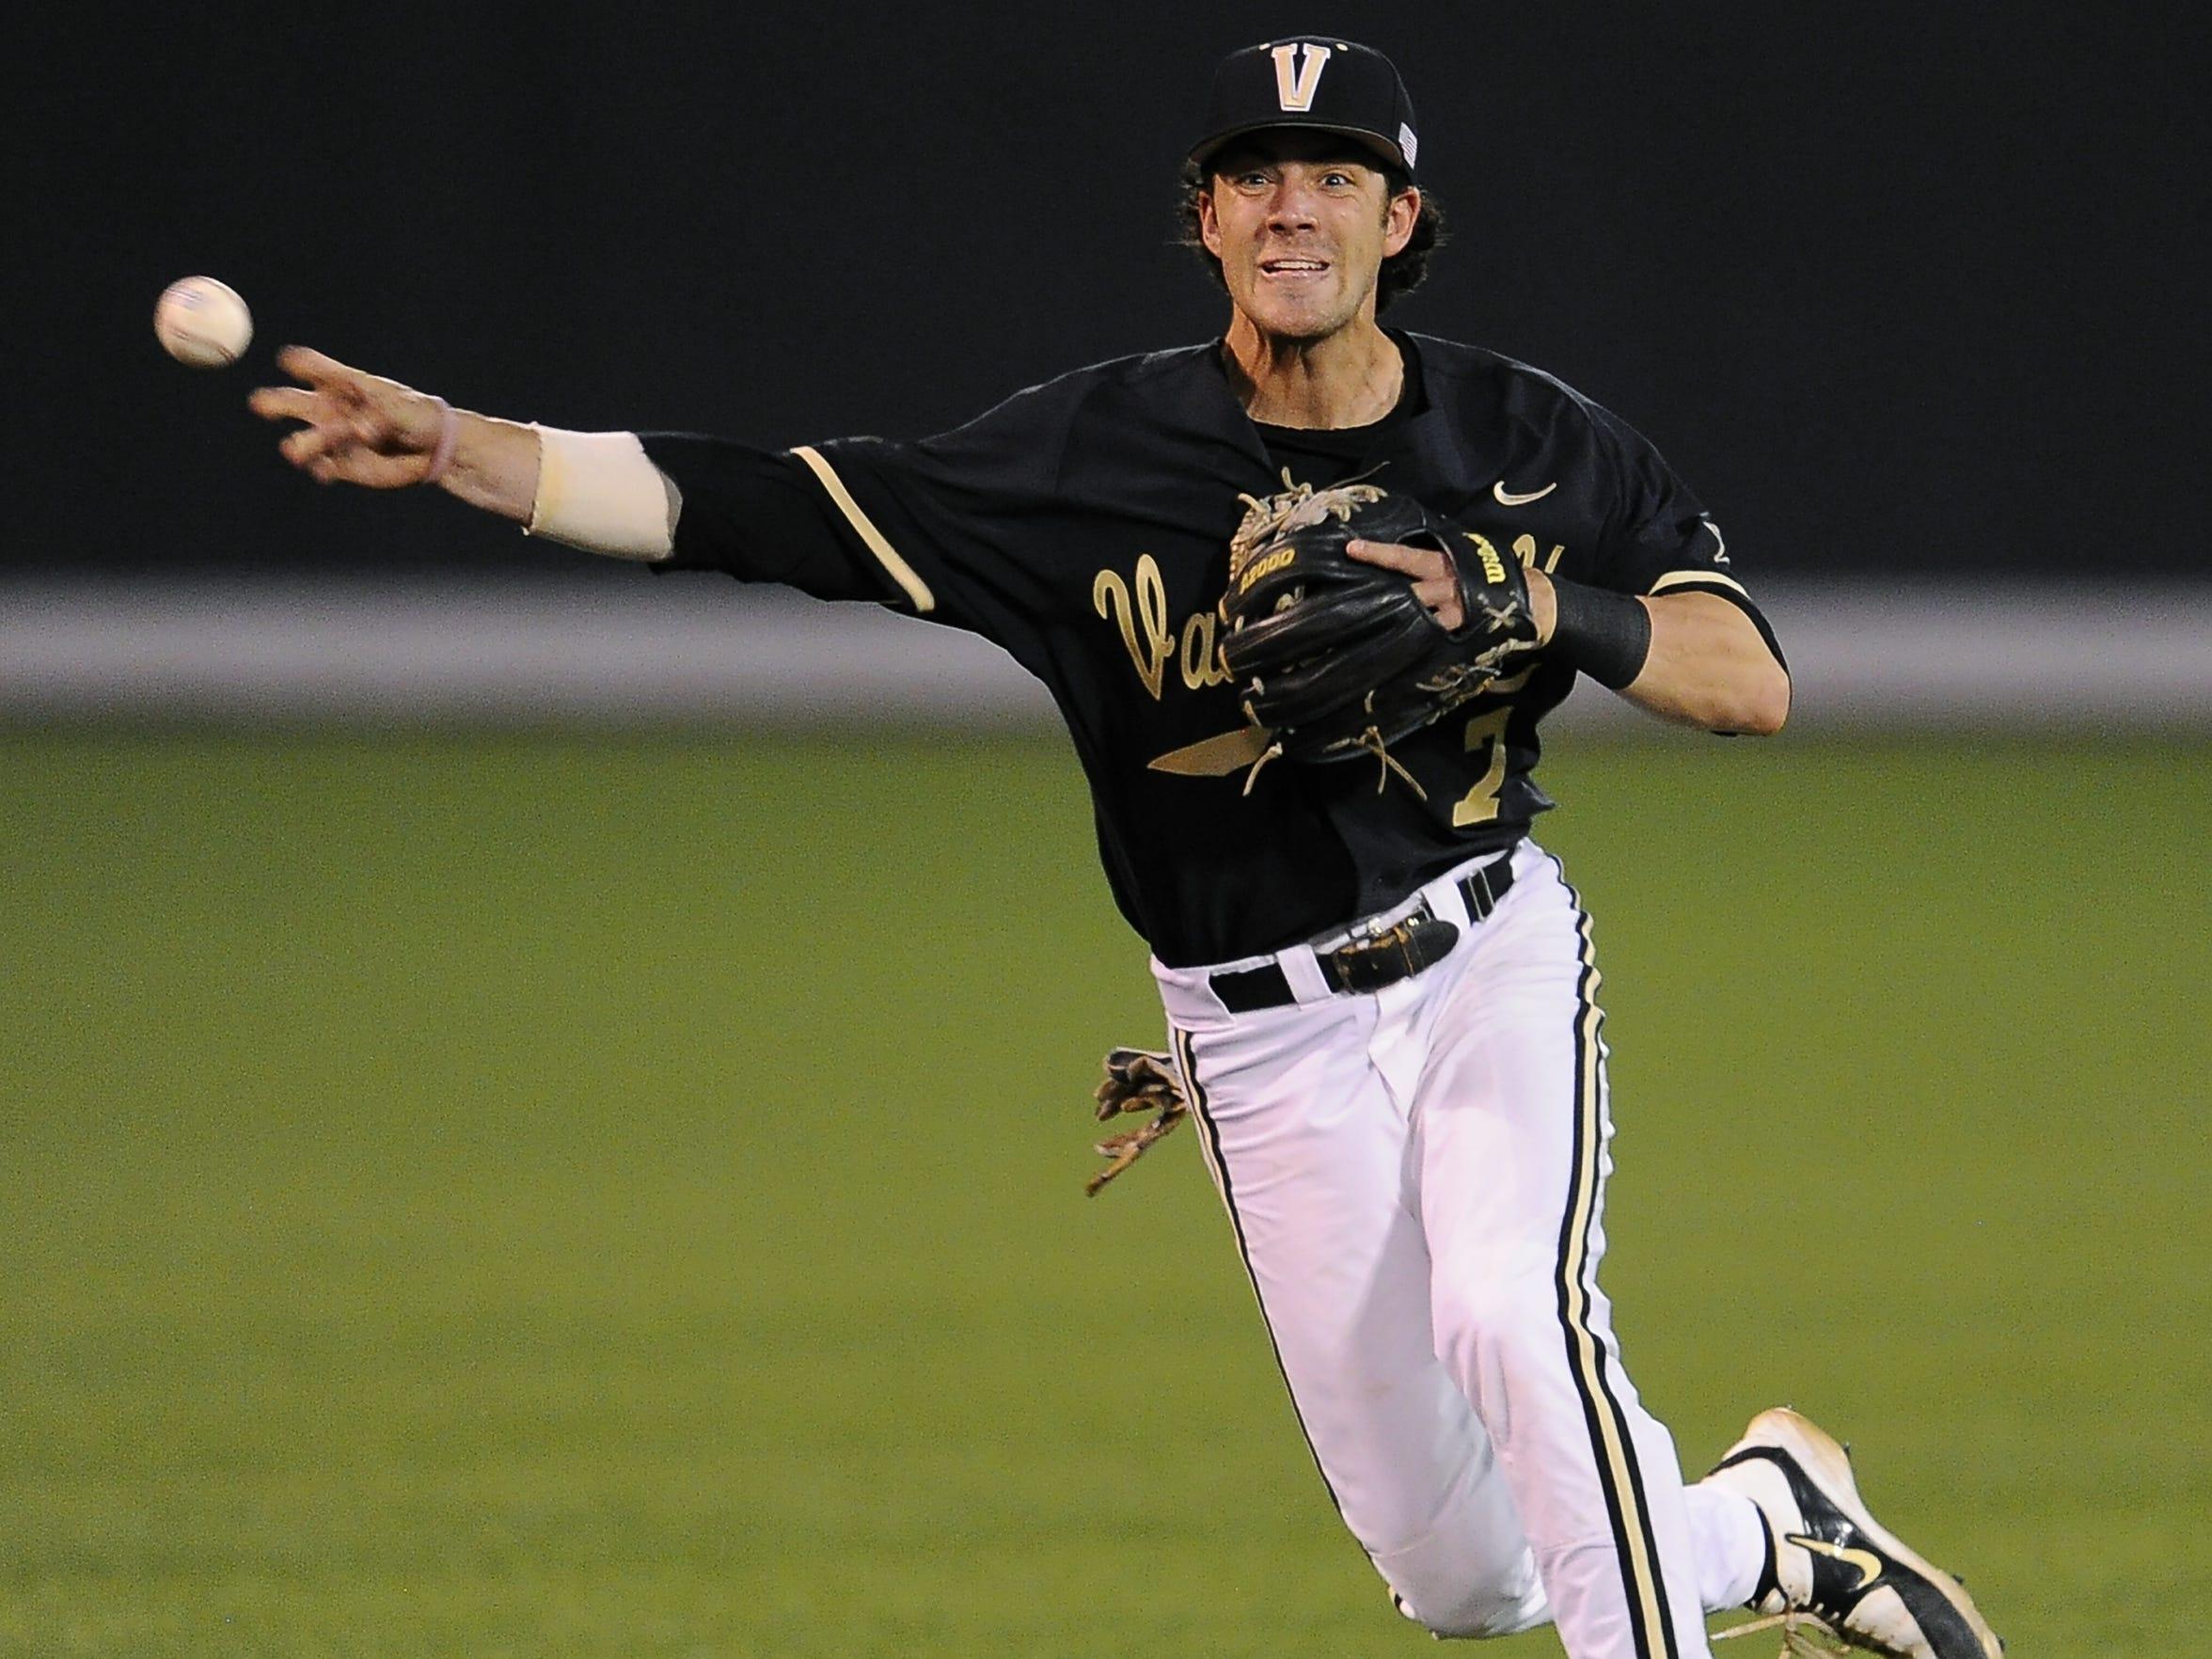 Vanderbilt short stop Dansby Swanson (7) makes a throw